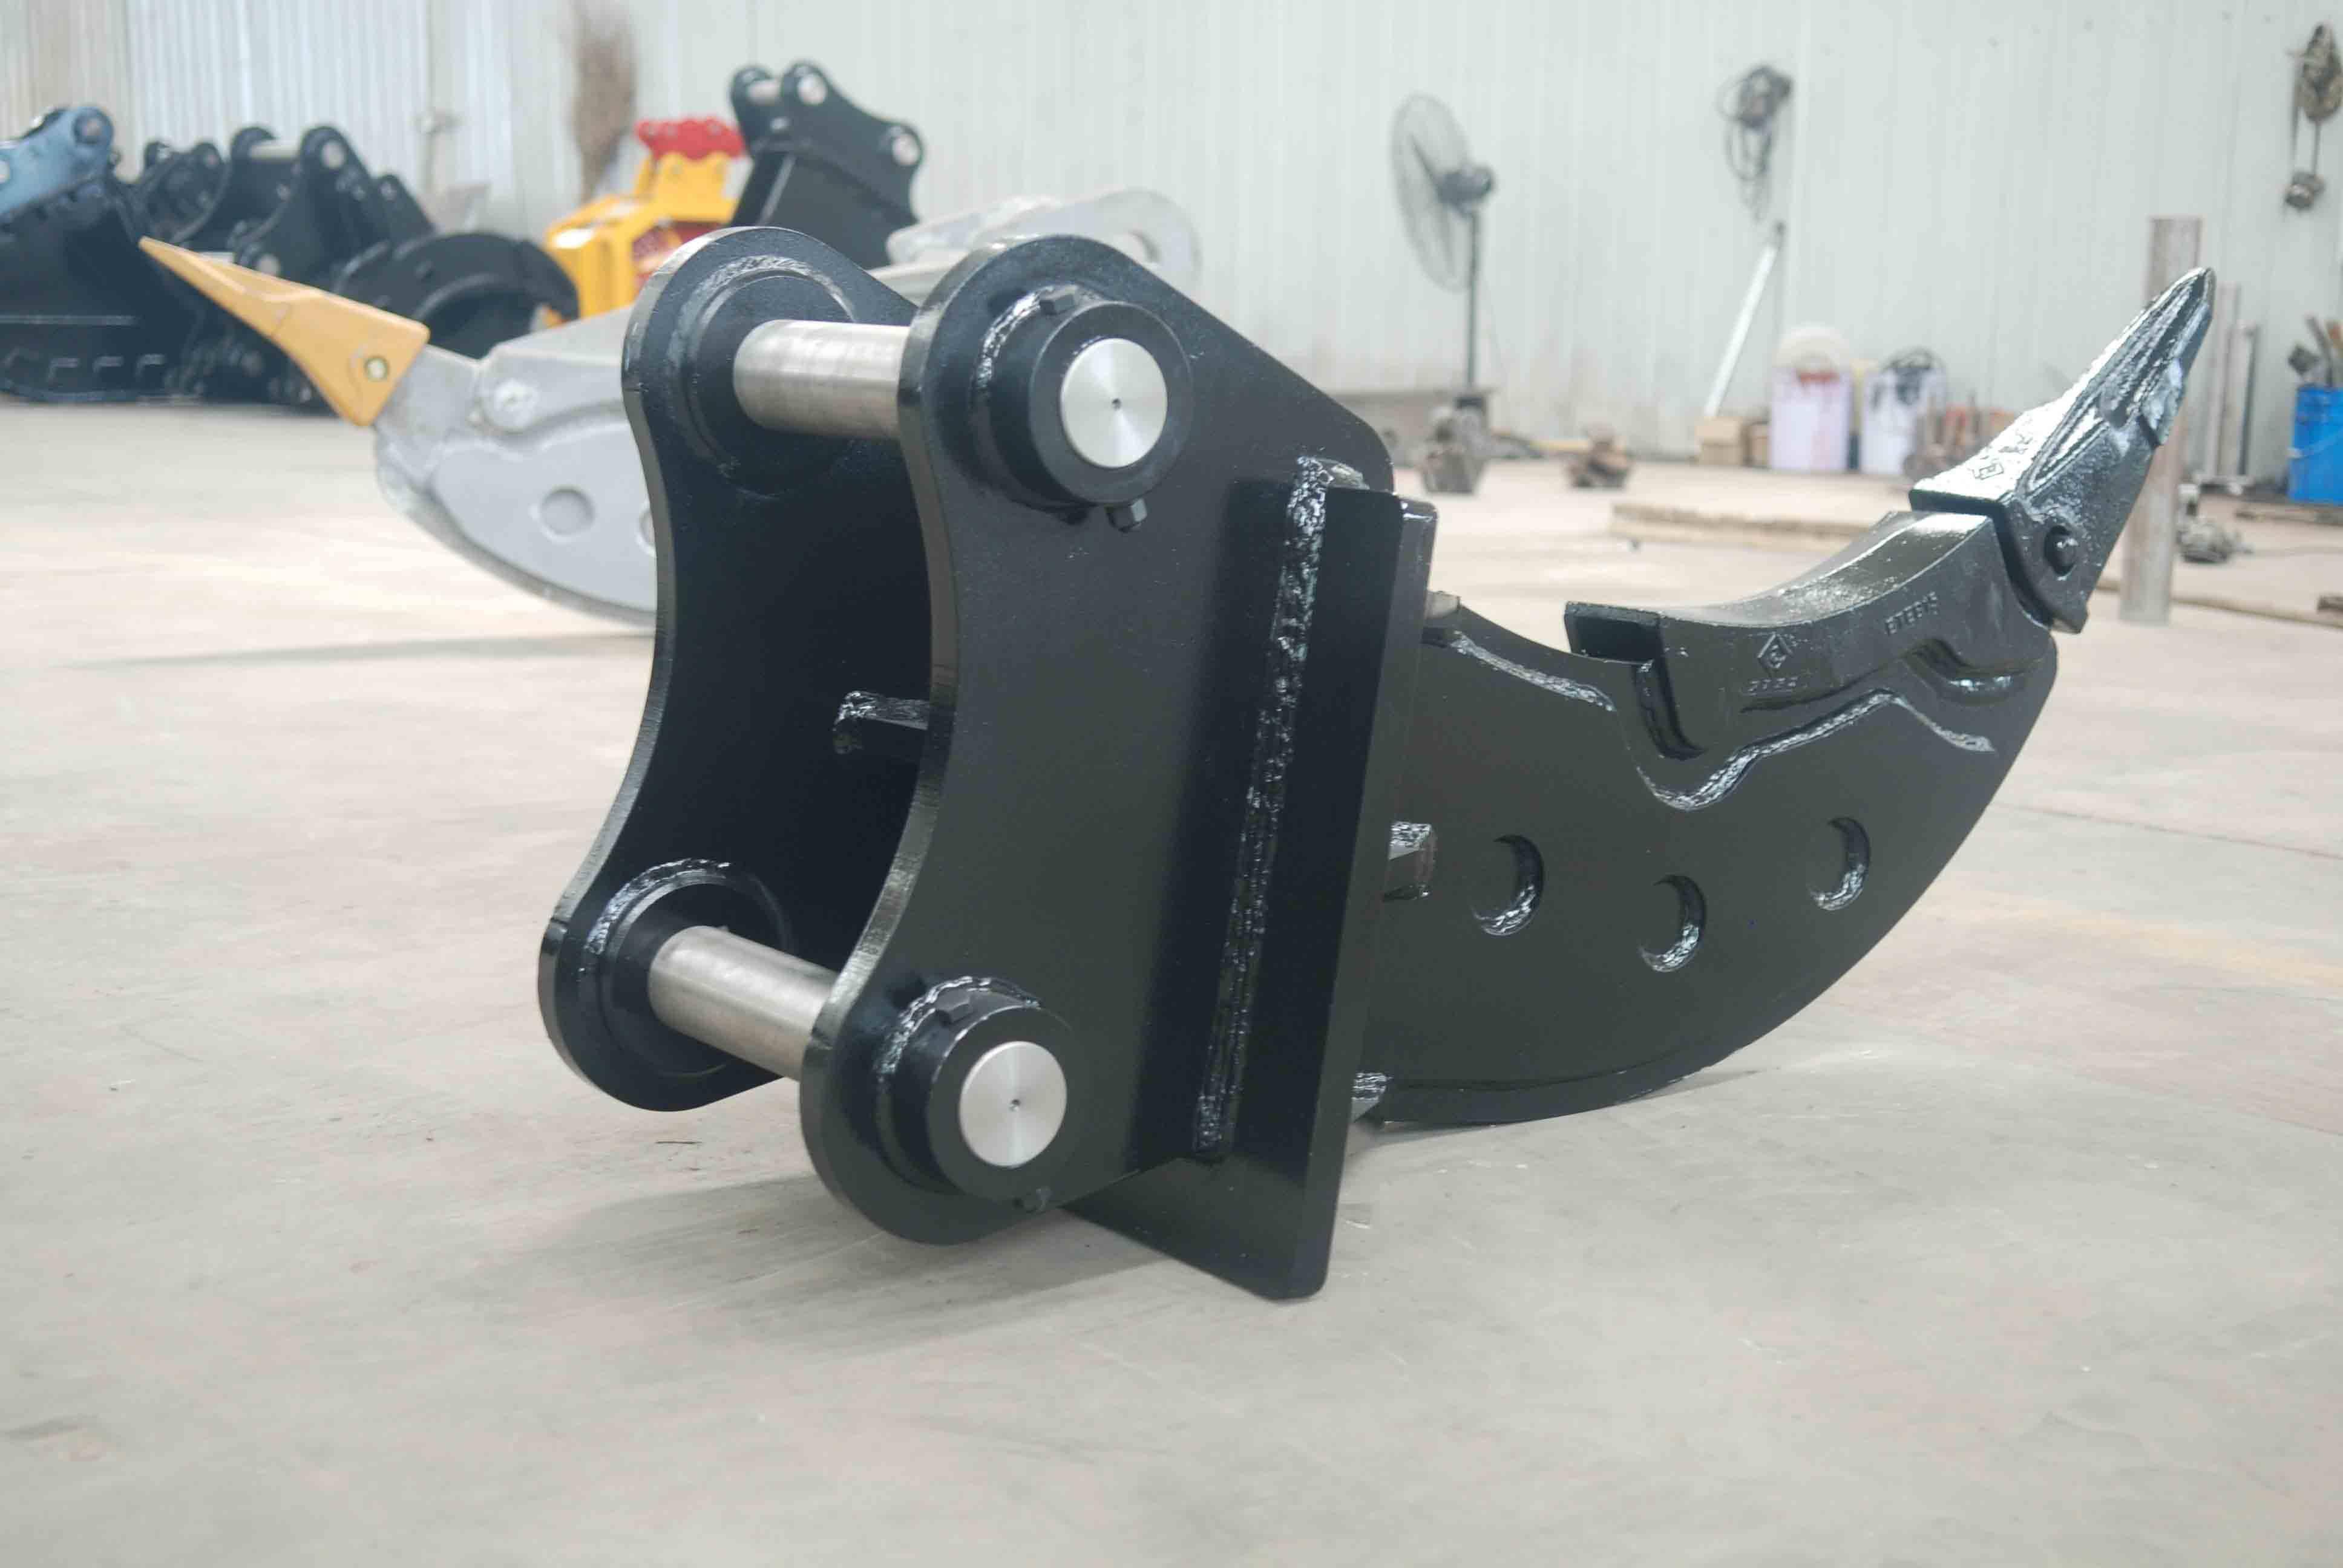 excavator attachment ripper for excavator/china supplier excavator ripper